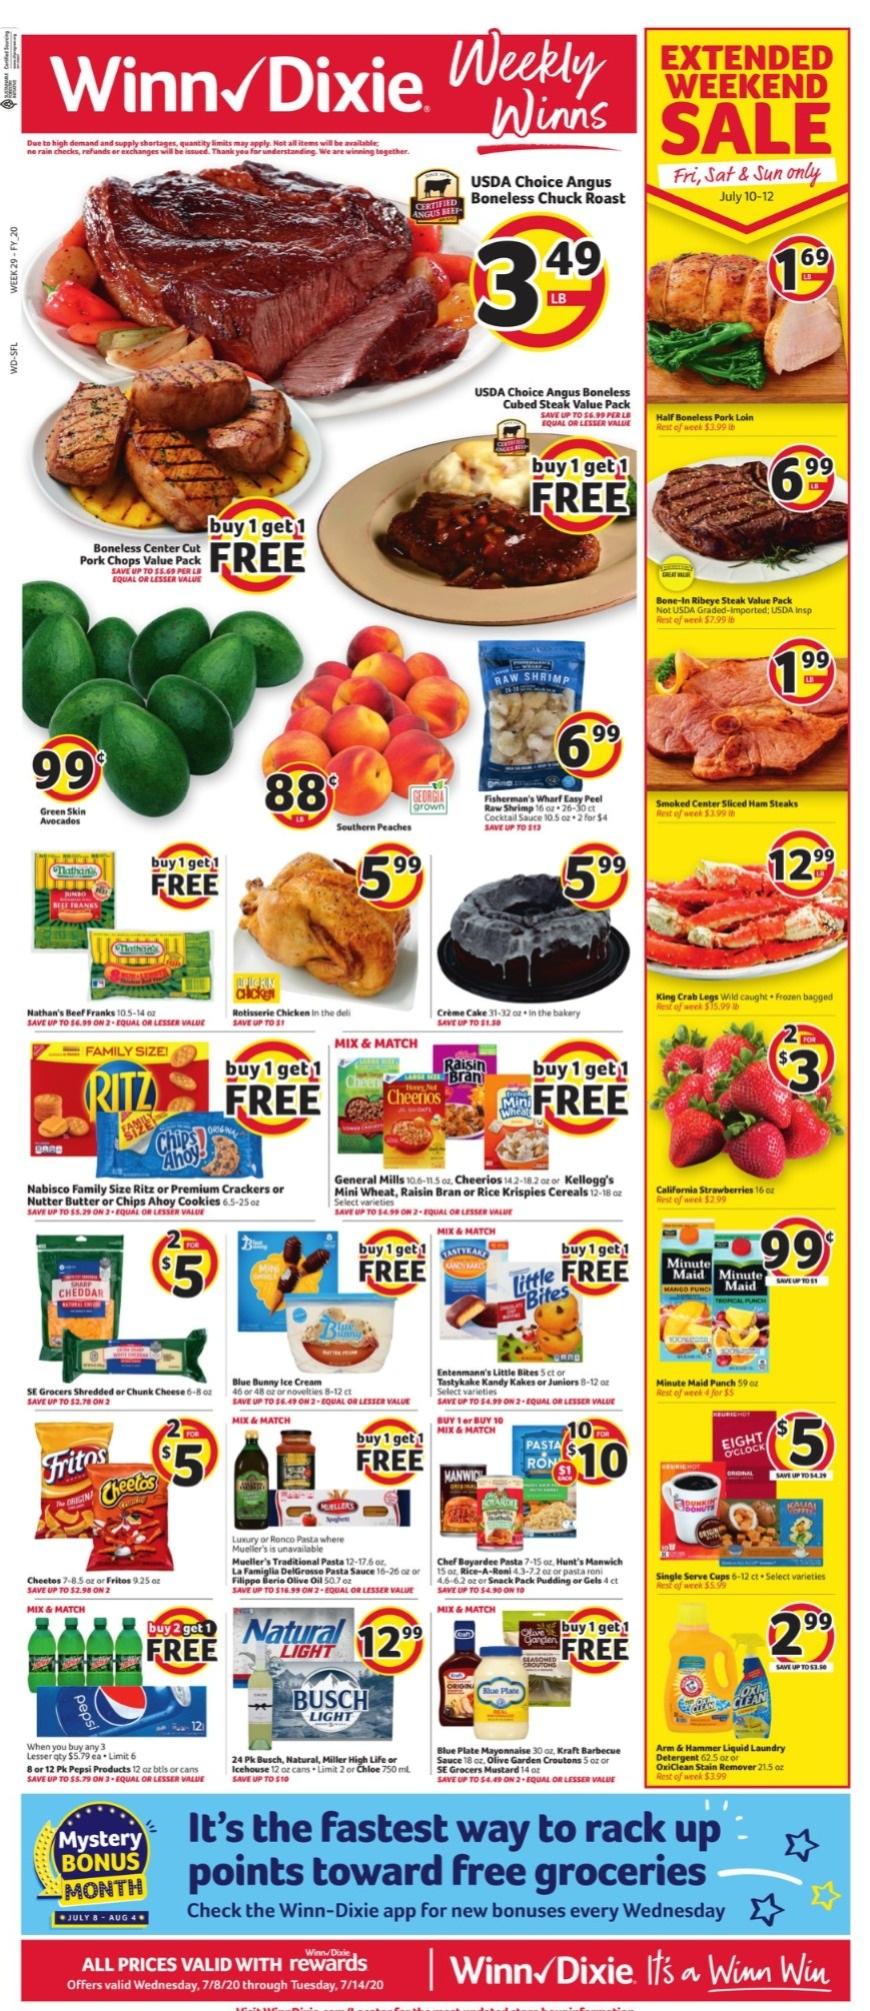 Winn Dixie Weekly Ad Circular - valid 07/08-07/14/2020